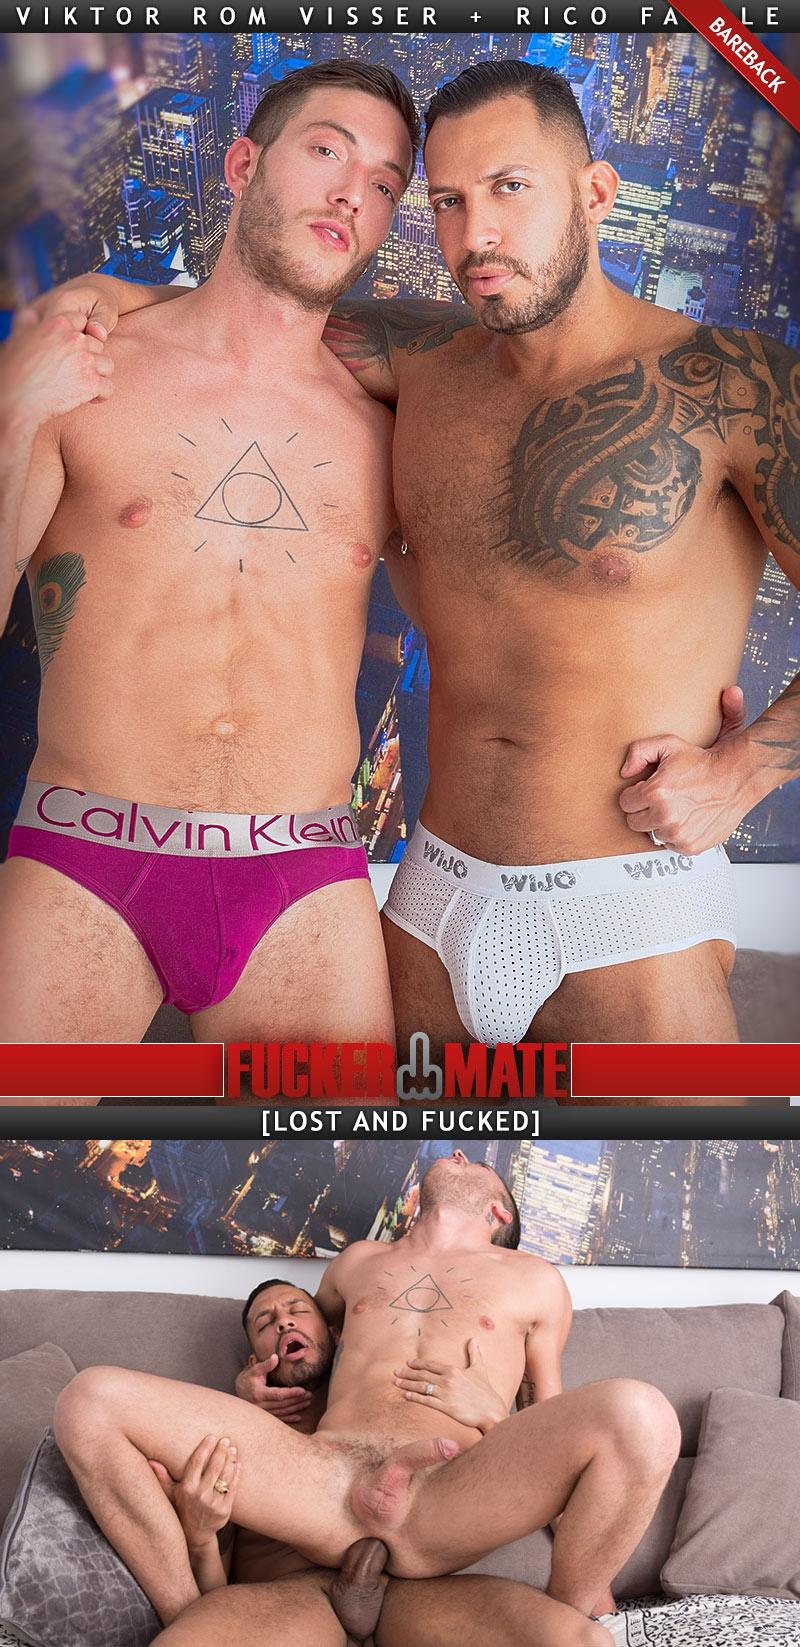 Lost and Fucked (Viktor Rom Visser Fucks Rico Fatale) (Bareback) at Fuckermate